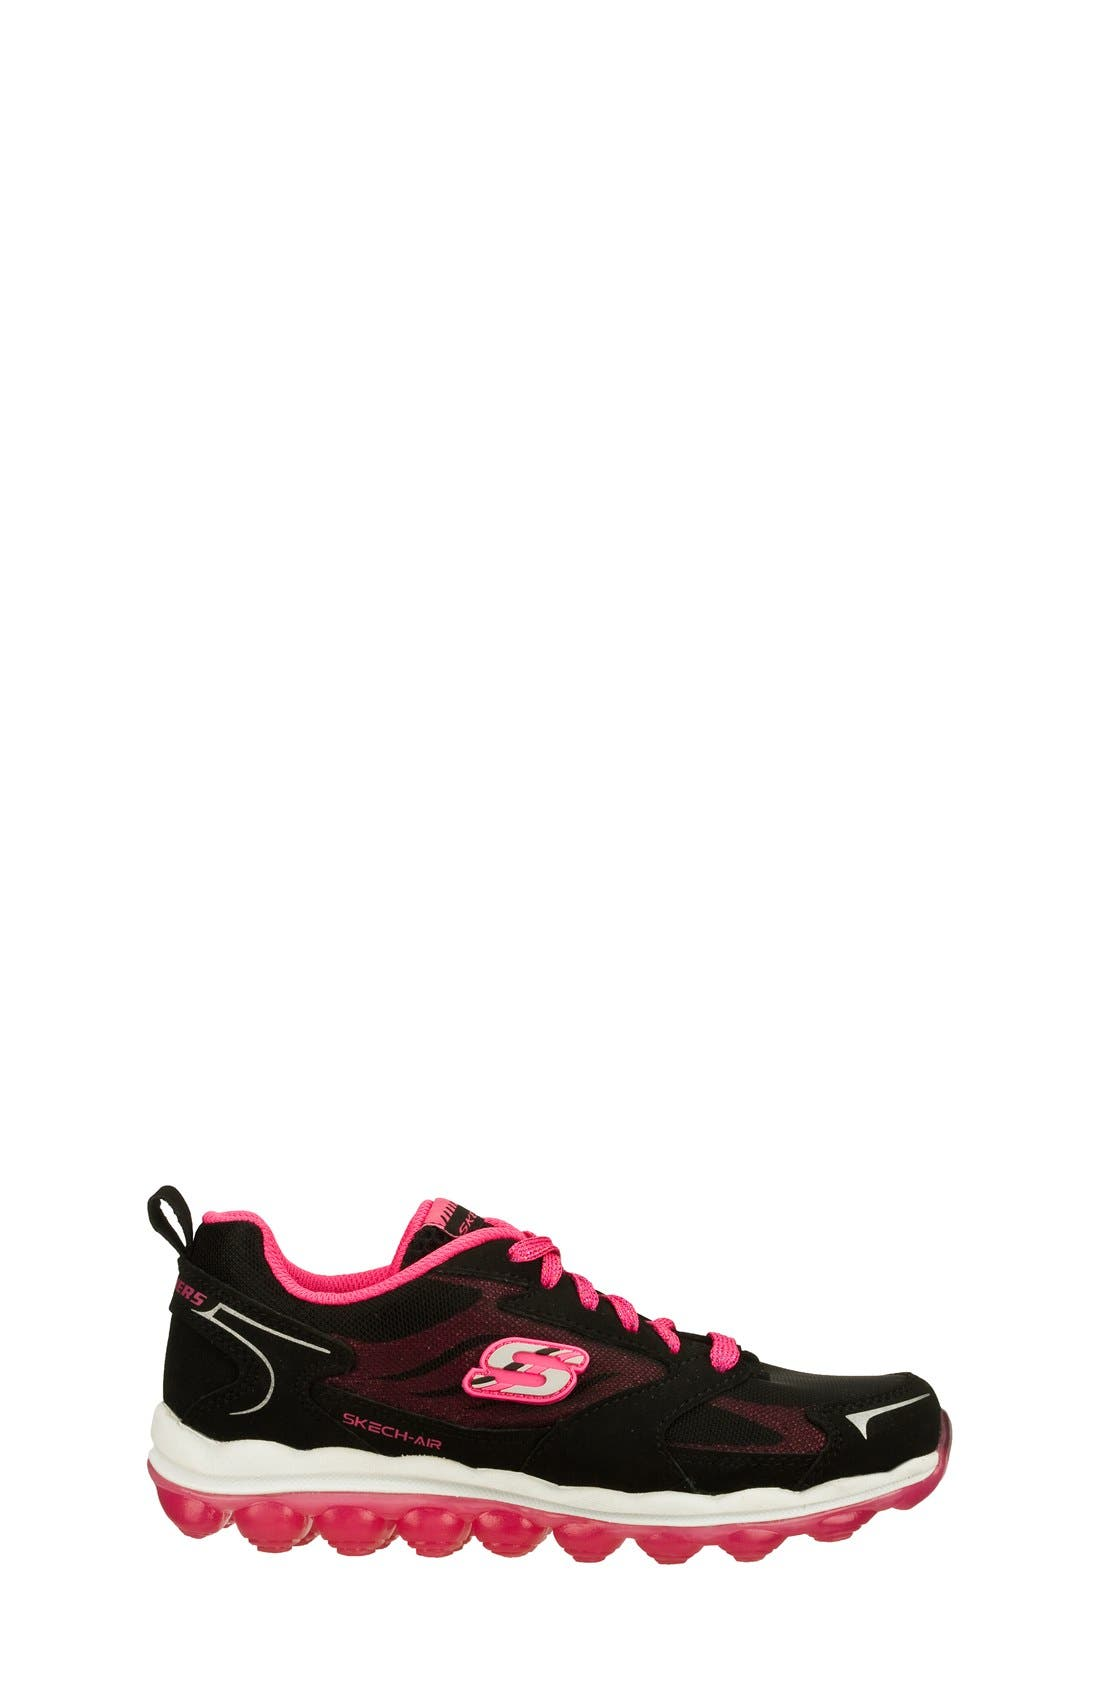 Alternate Image 3  - SKECHERS 'Skech Air - Bizzy Bounce' Sneaker (Toddler, Little Kid & Big Kid)